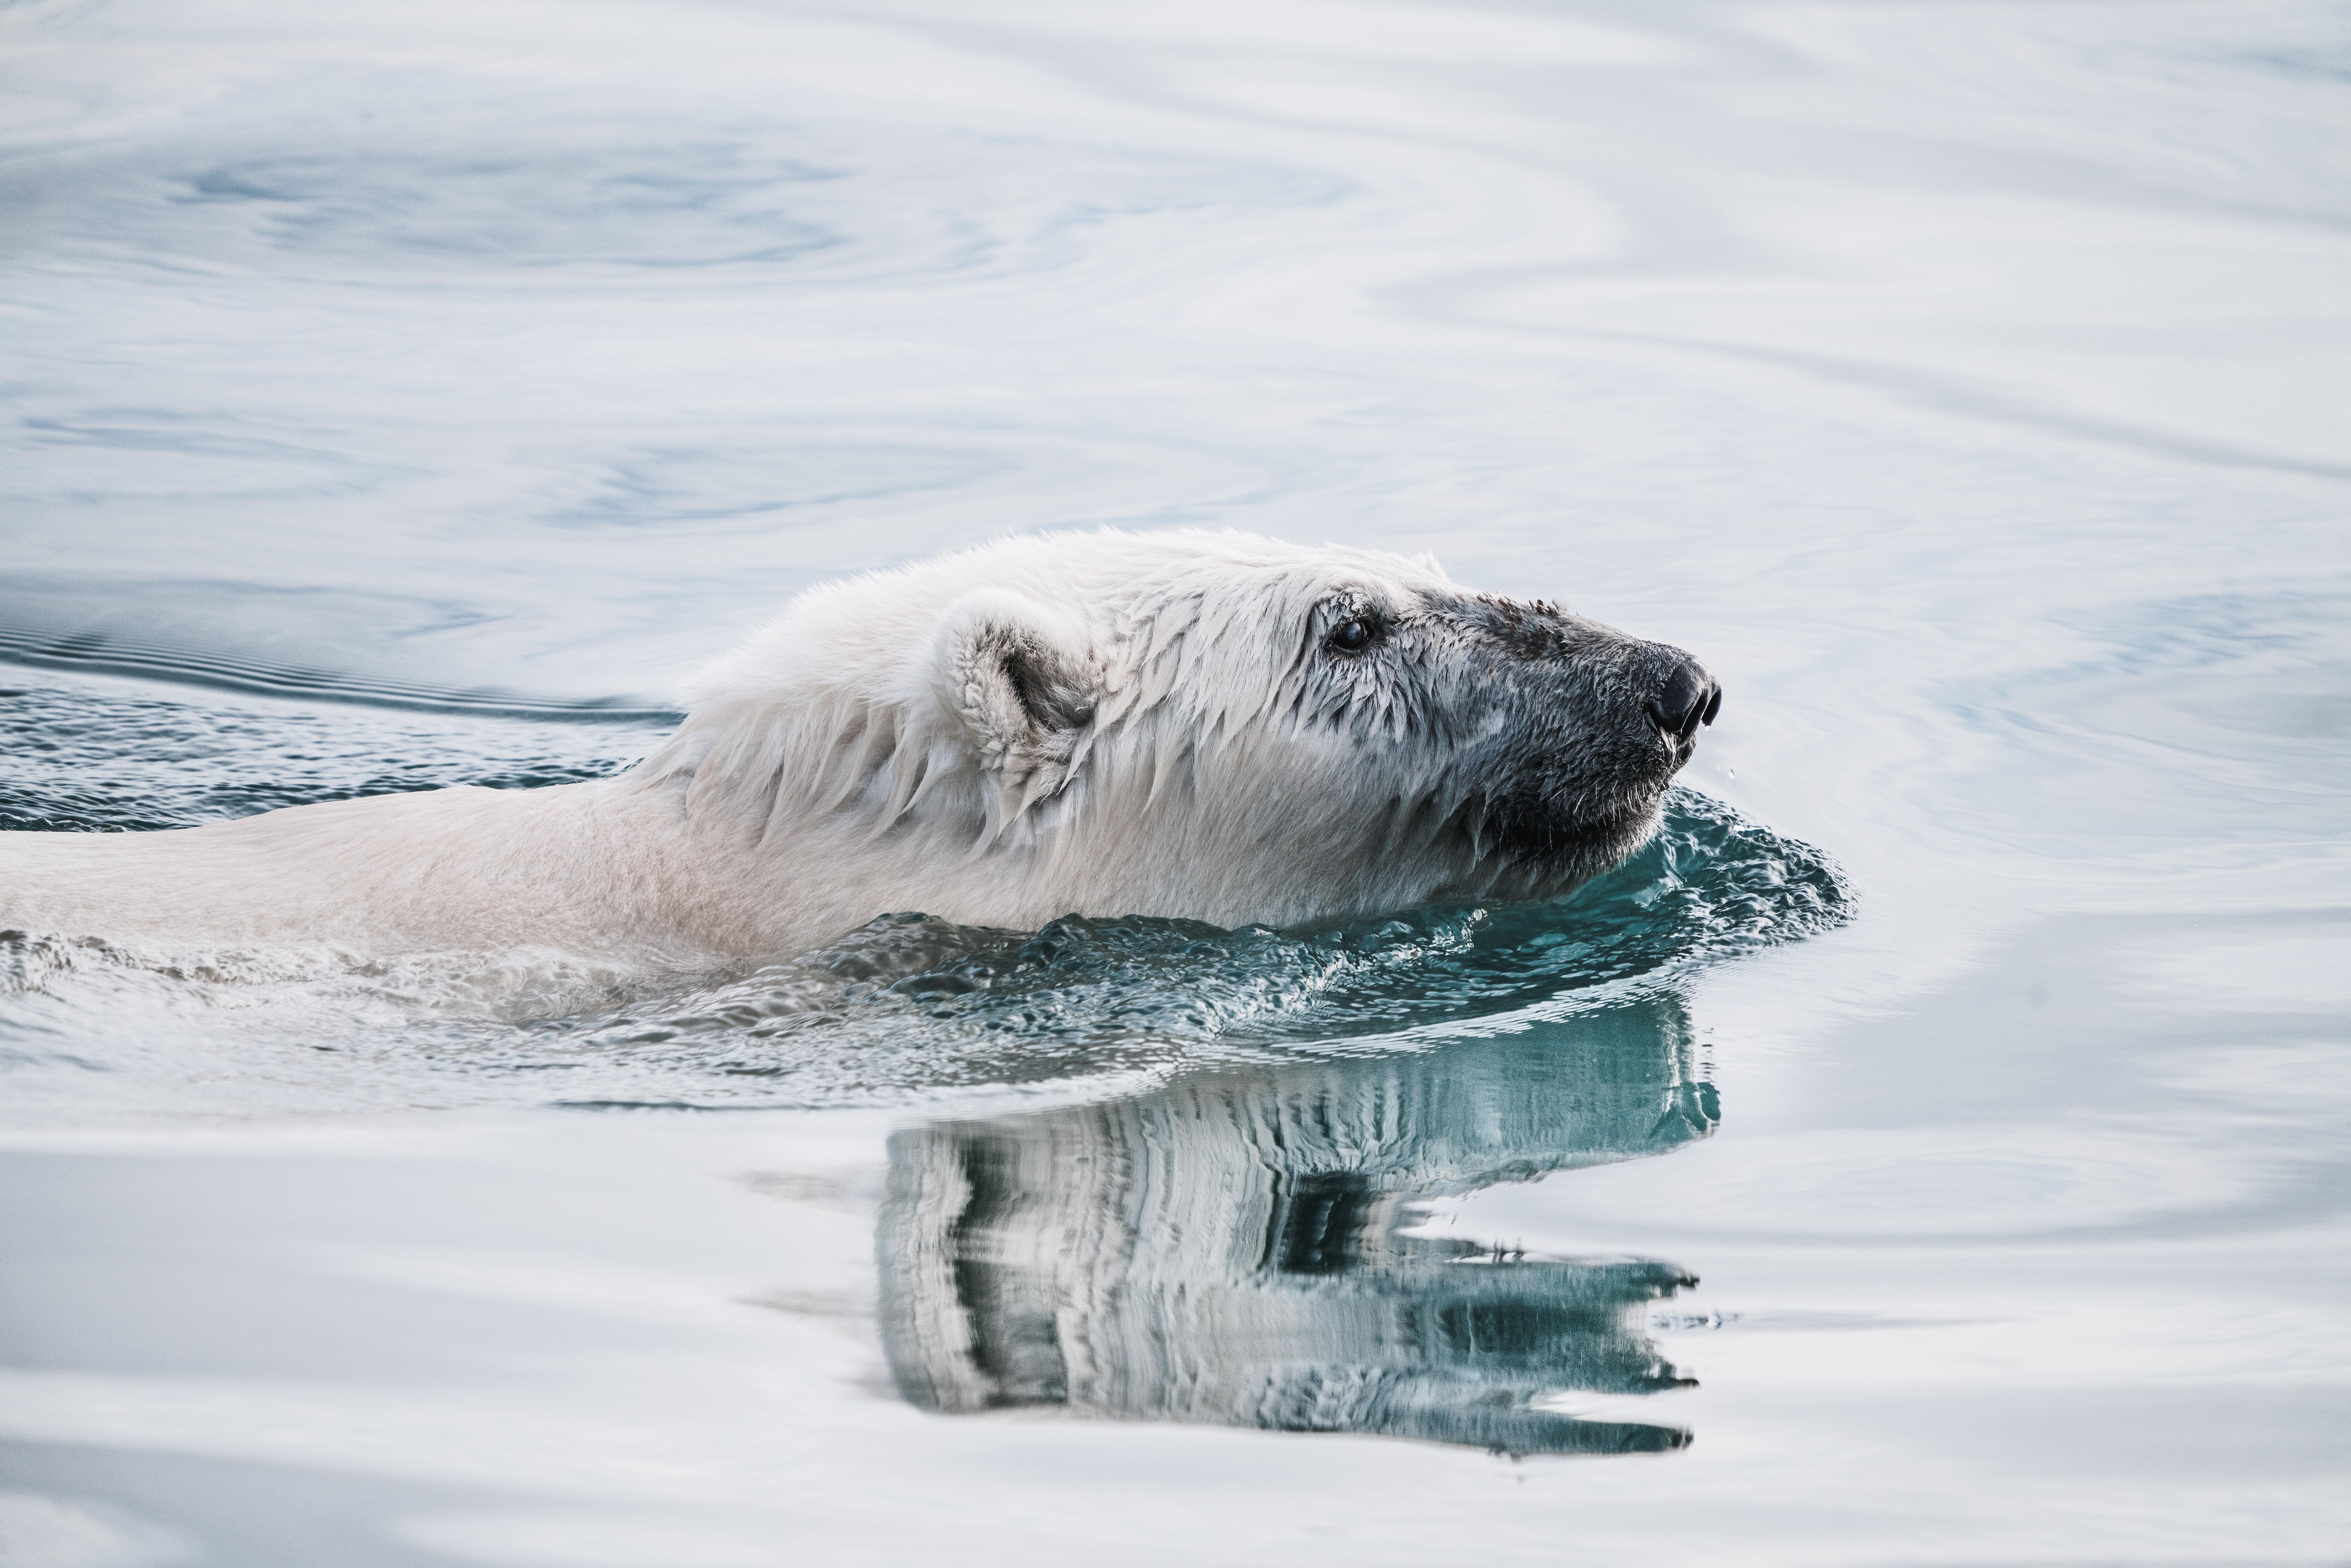 A polar bear swimming